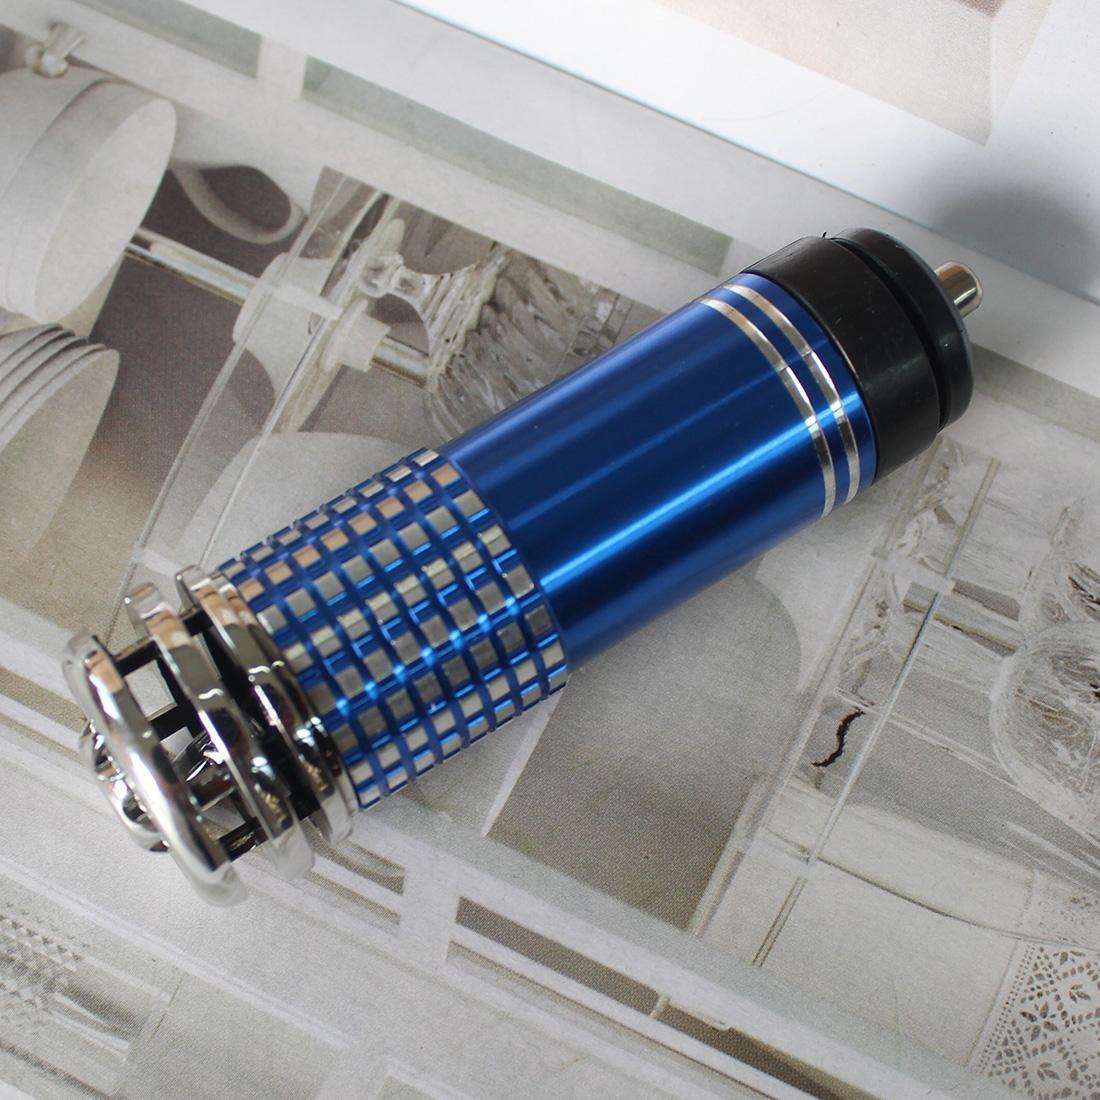 2016 12 V mobil mini Udara Segar ionik alat pembersih bar oksigen ozon Ionizer tenaga pembersih